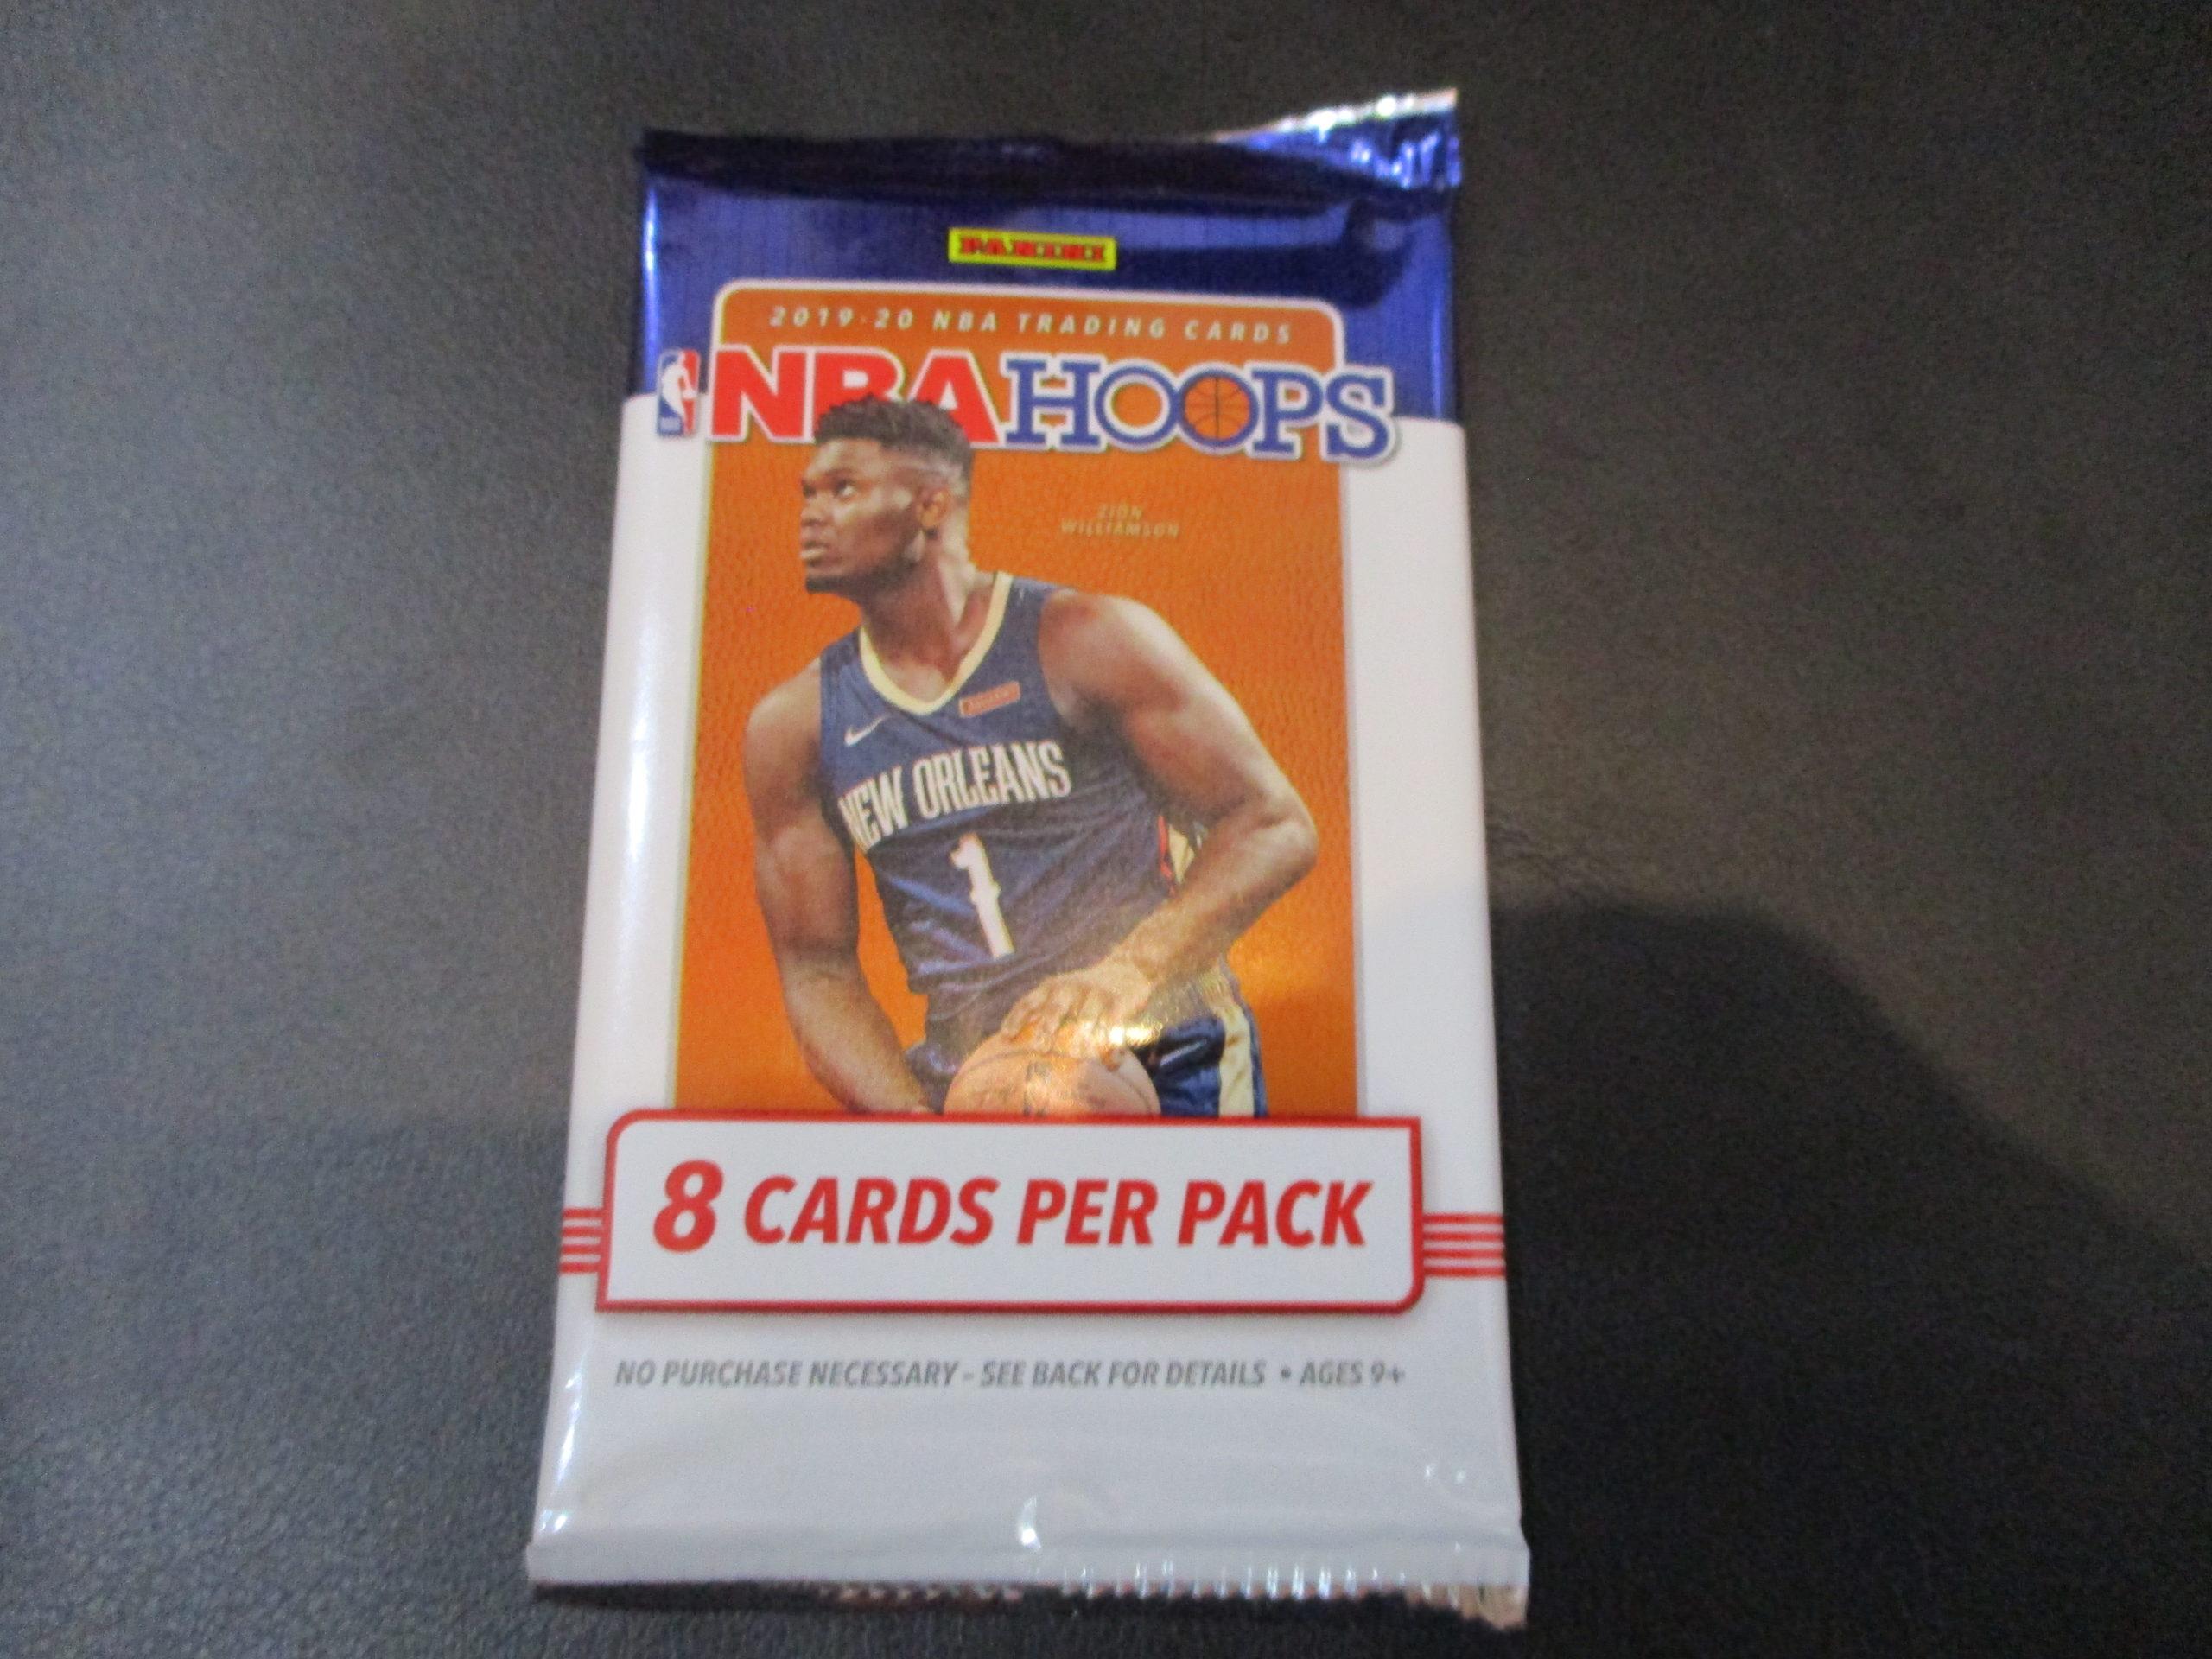 NBAトレーディングカード開封(第20回)